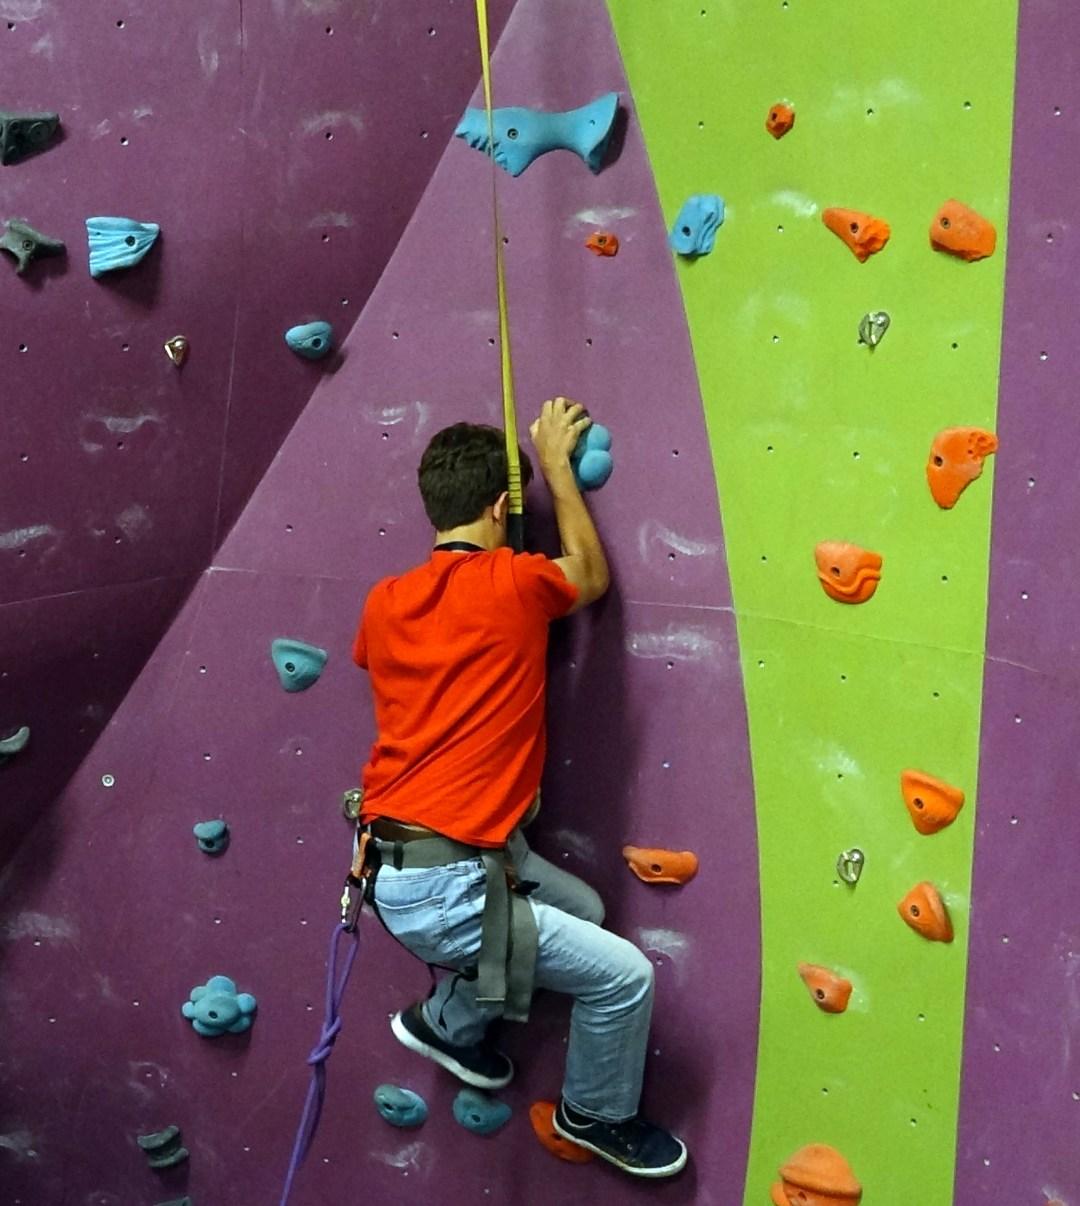 6-22 sportscamp (5) rock climb